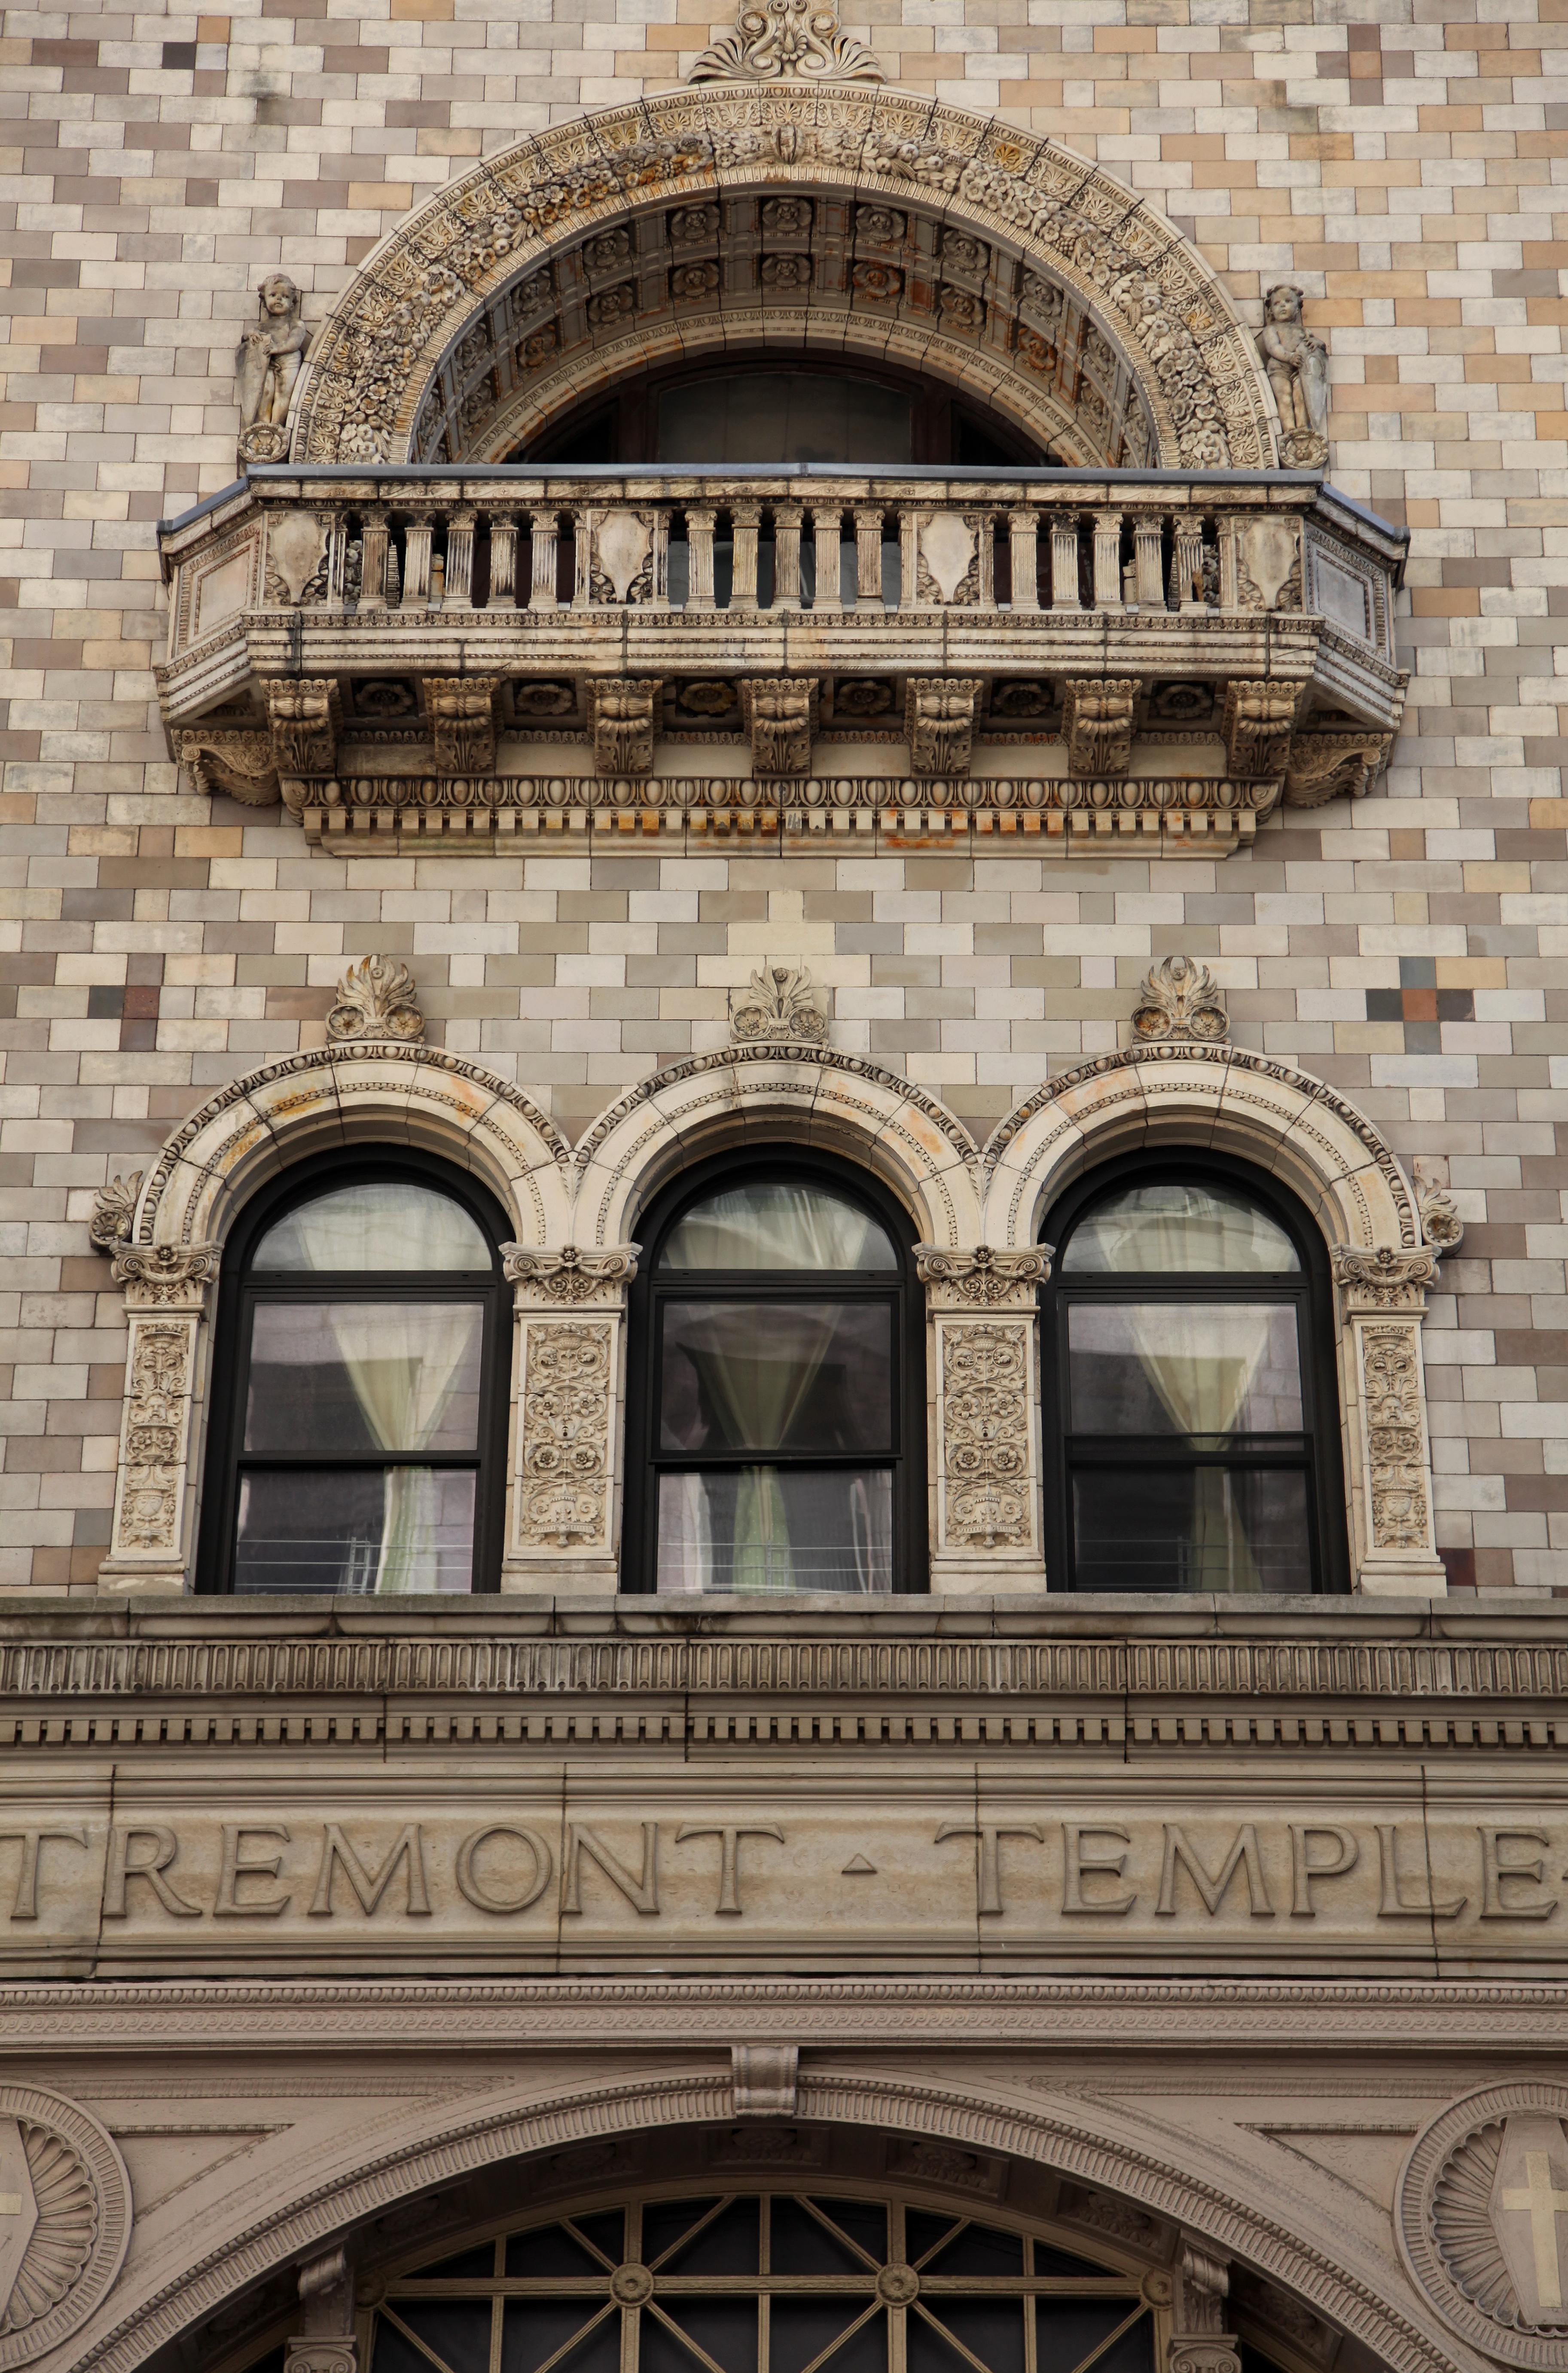 File:Facade of Tremont Temple Baptist church in Boston